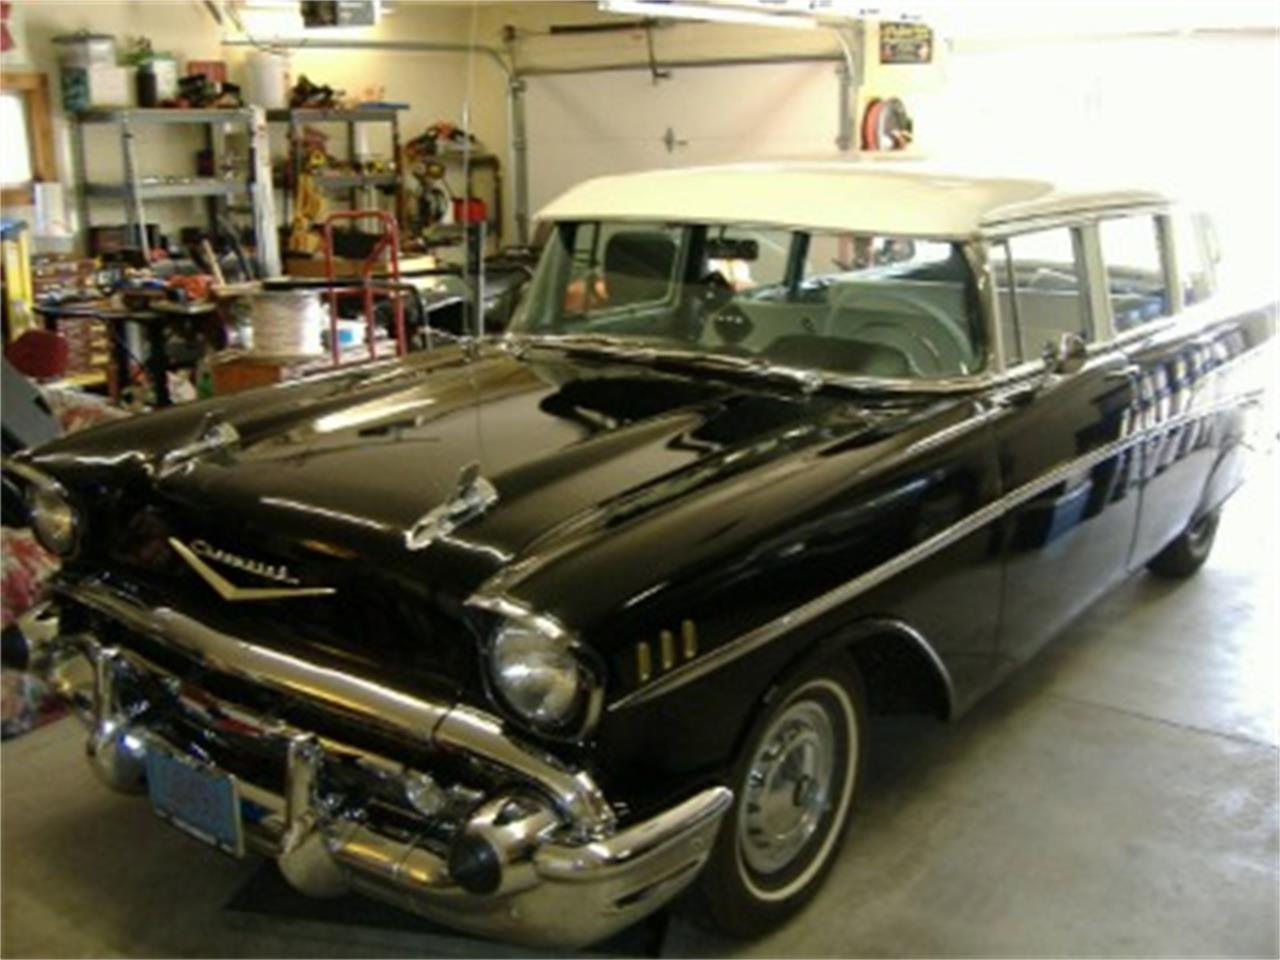 For Sale 1957 Chevrolet Station Wagon In Mundelein Illinois